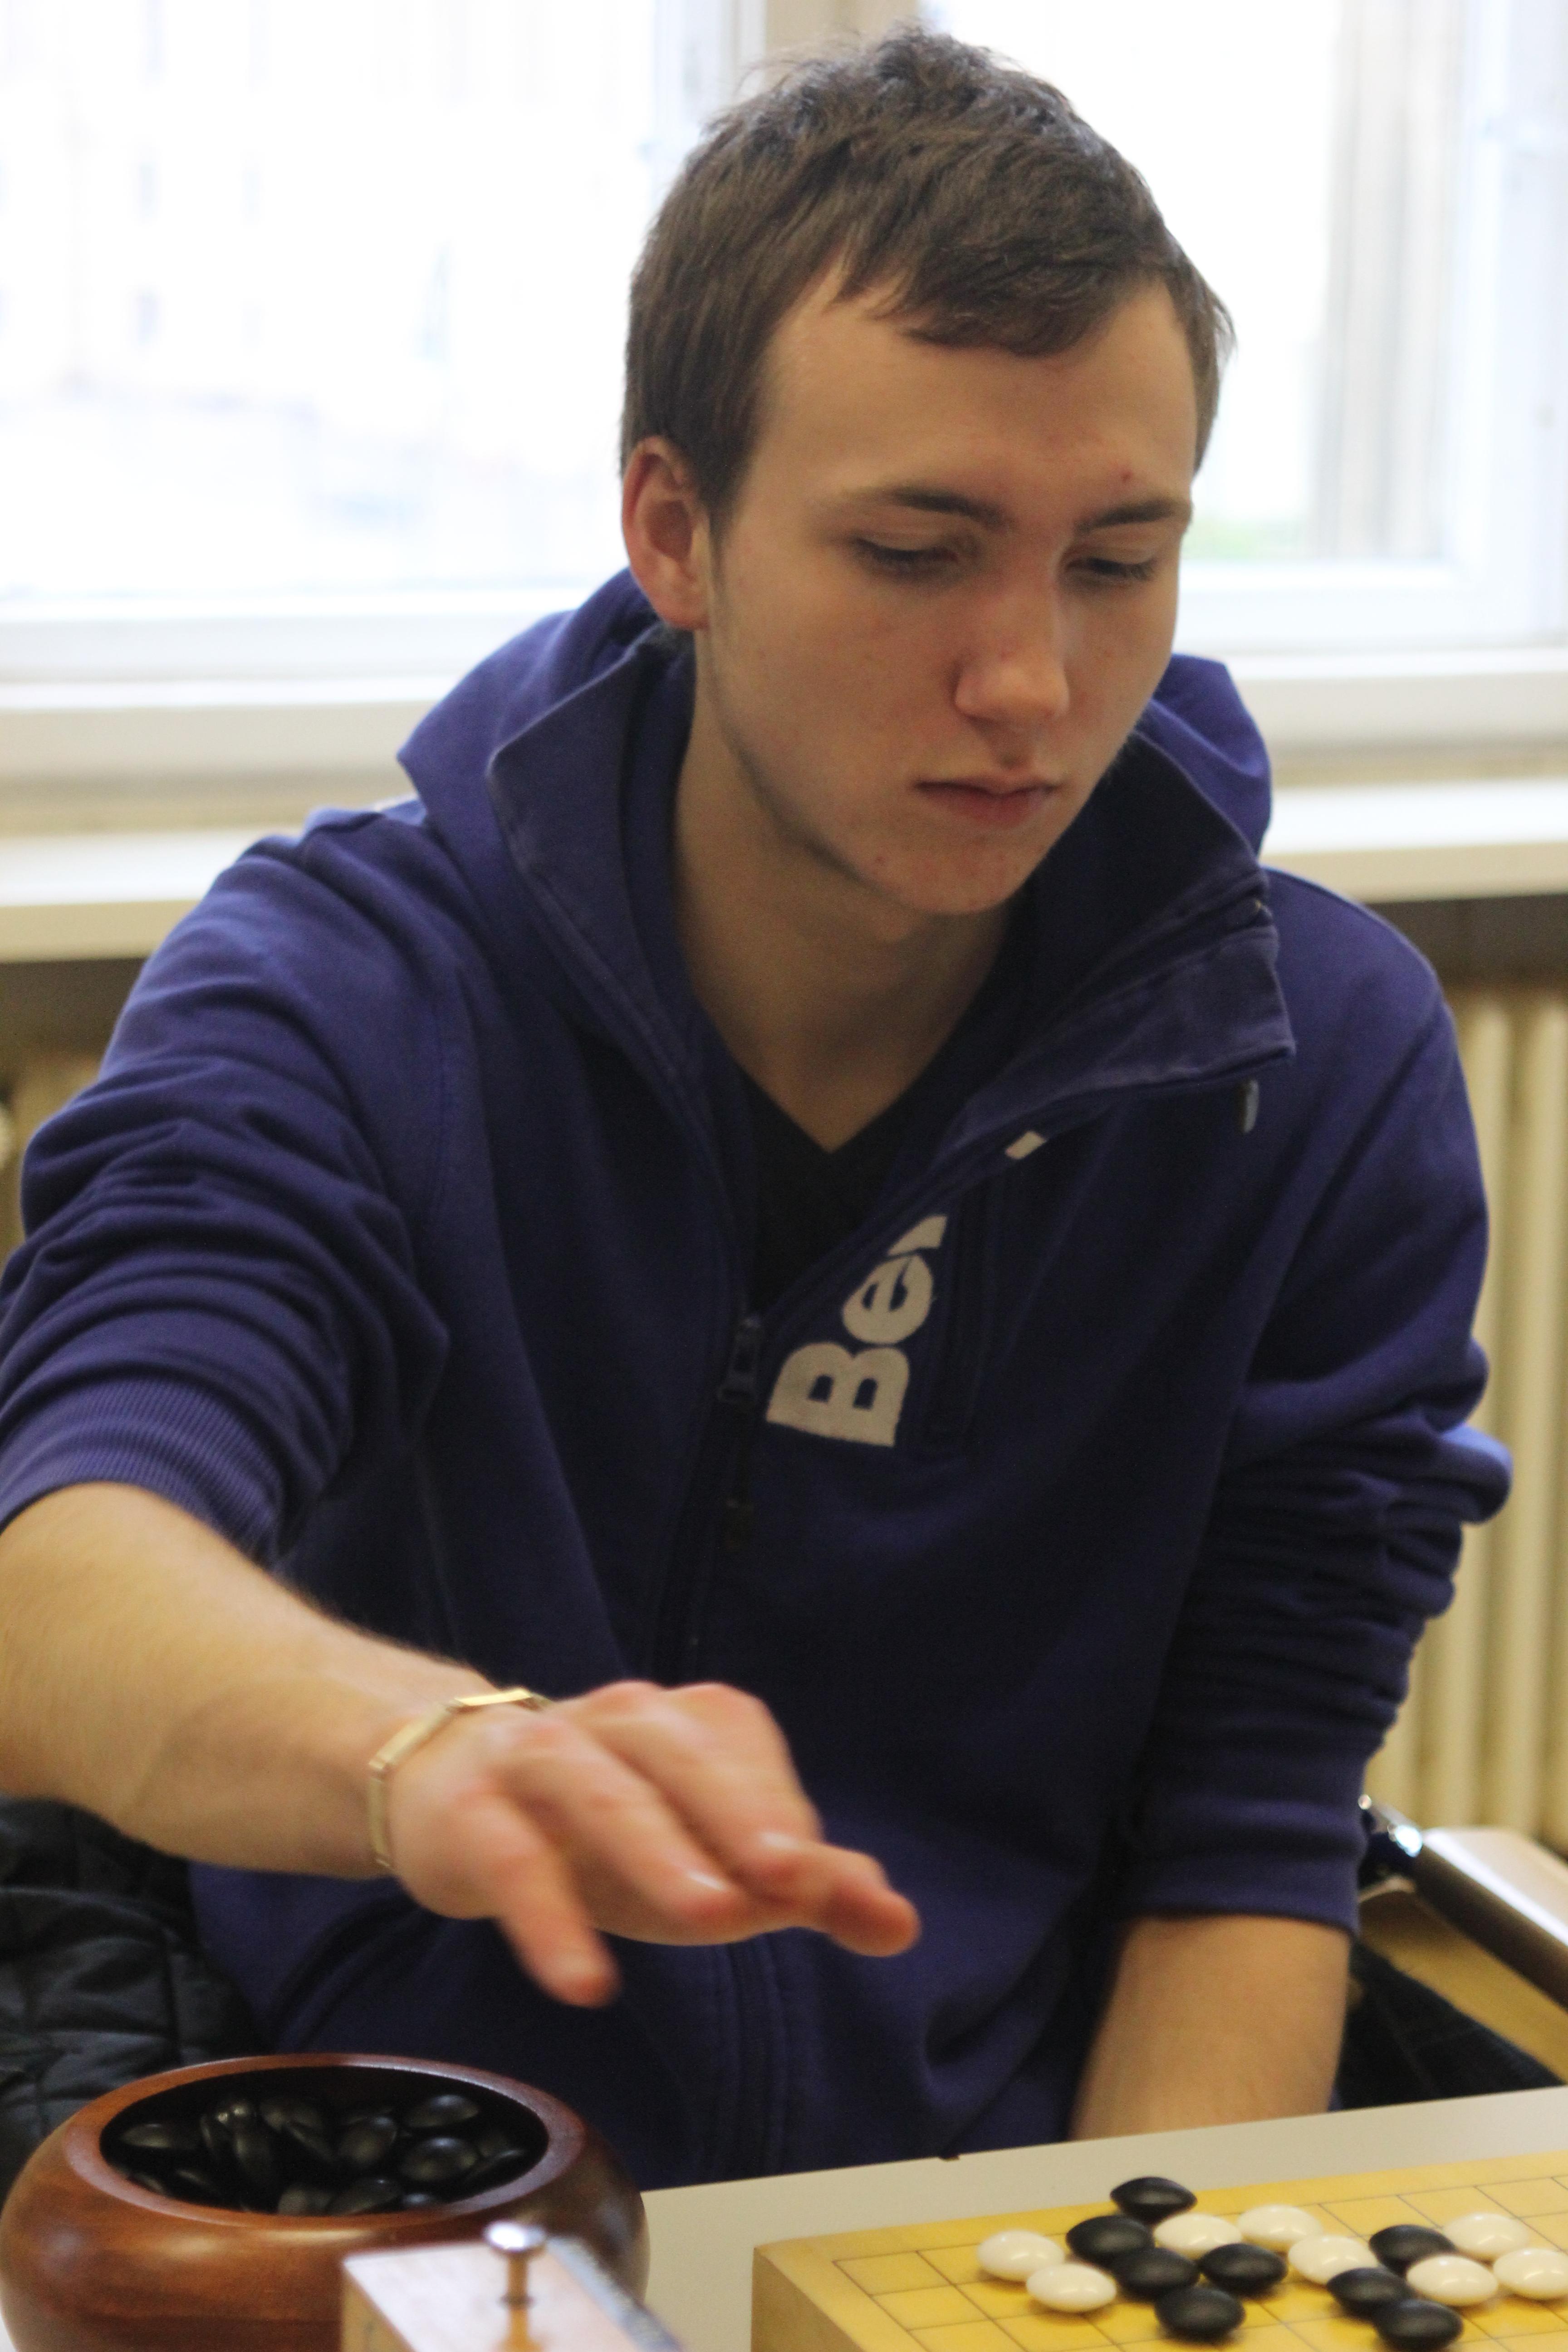 http://www.eurogotv.com/images/jonaskranich2012.JPG